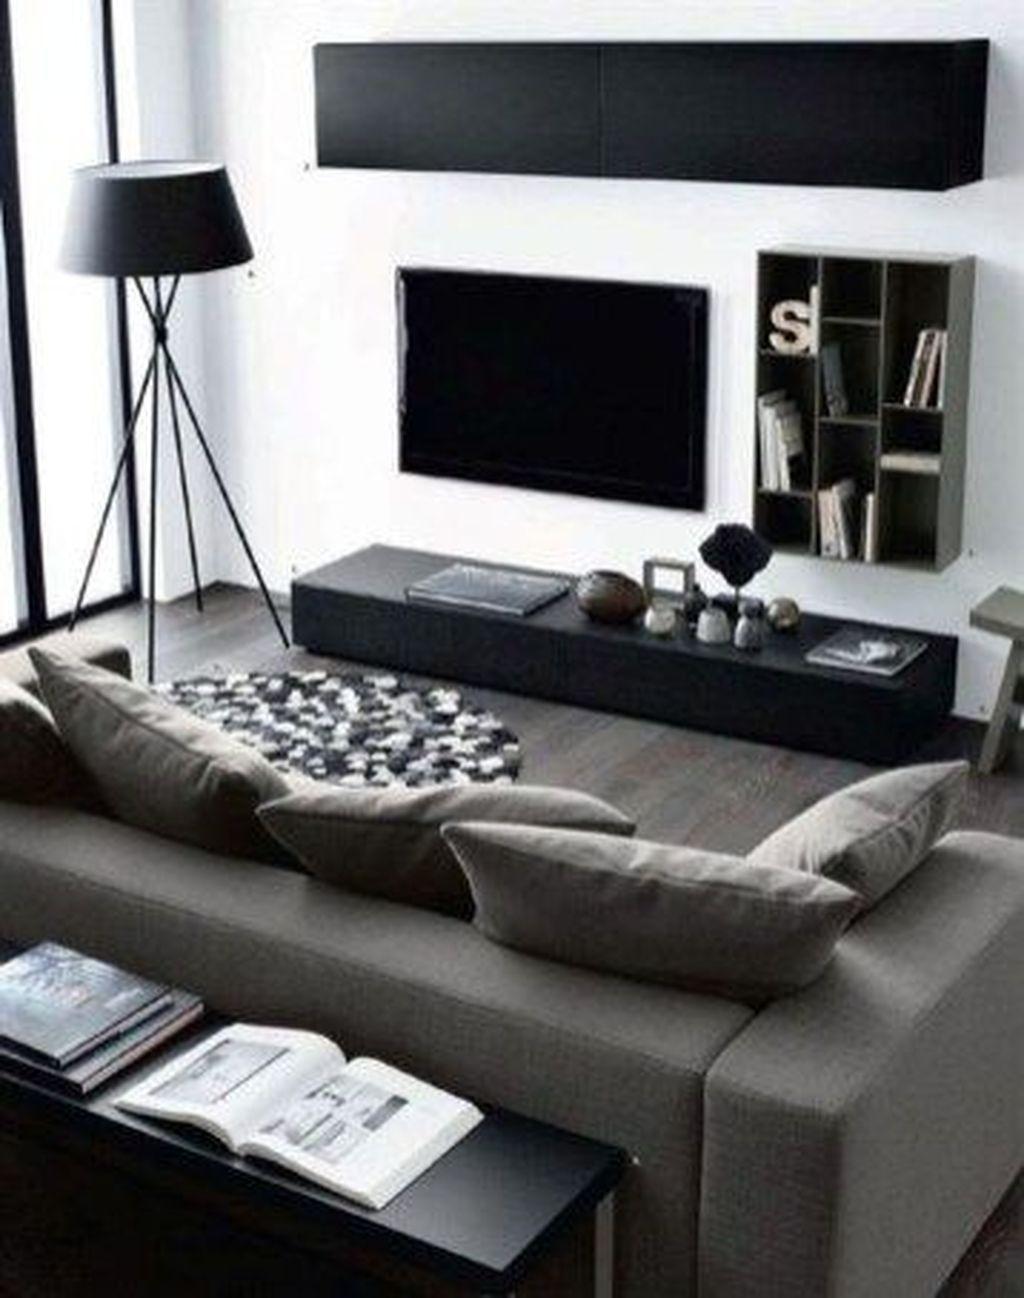 50 Small Living Room Ideas: 50 Cozy Small Living Room Decor Ideas On A Budget